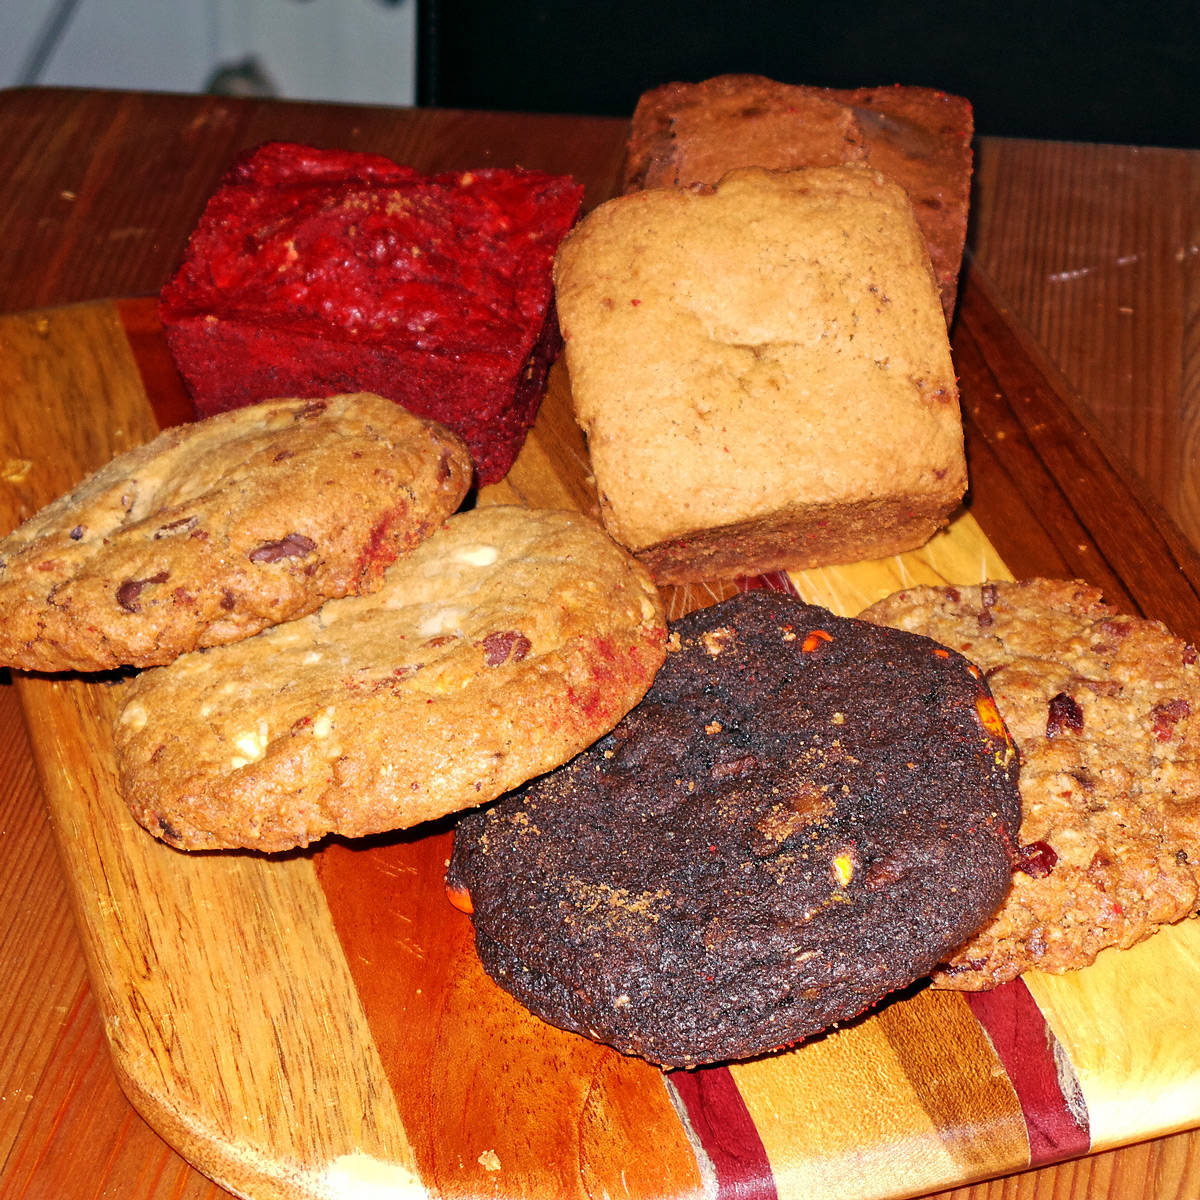 The Baconery Holiday Bacon Baked Goods Basket